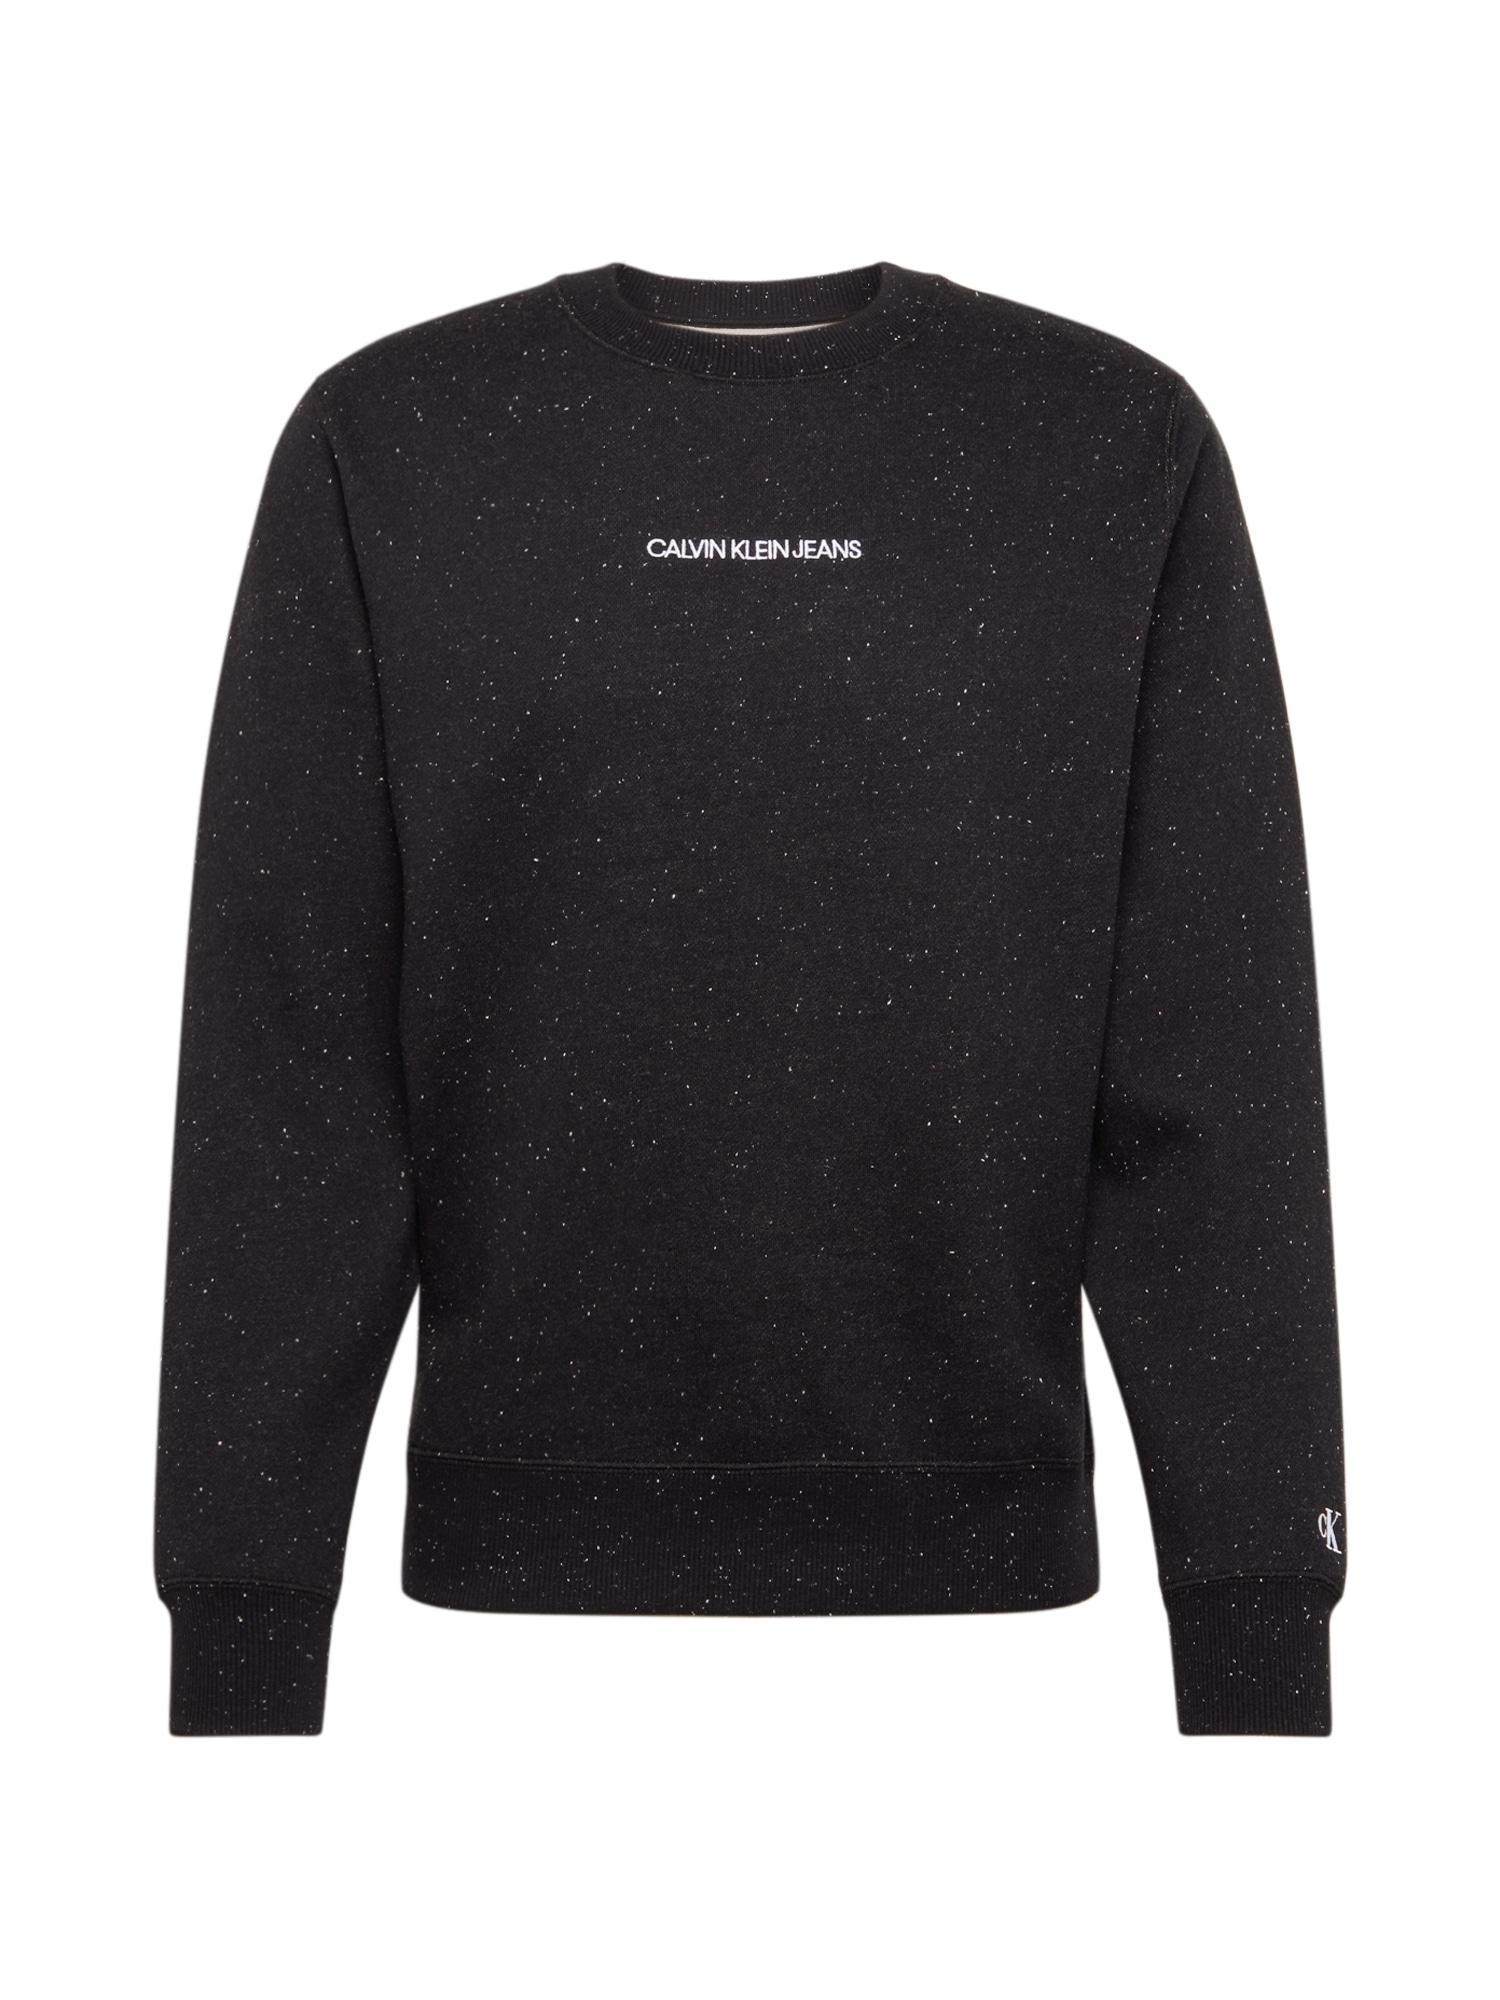 Calvin Klein Jeans Megztinis be užsegimo 'NAPS' juoda